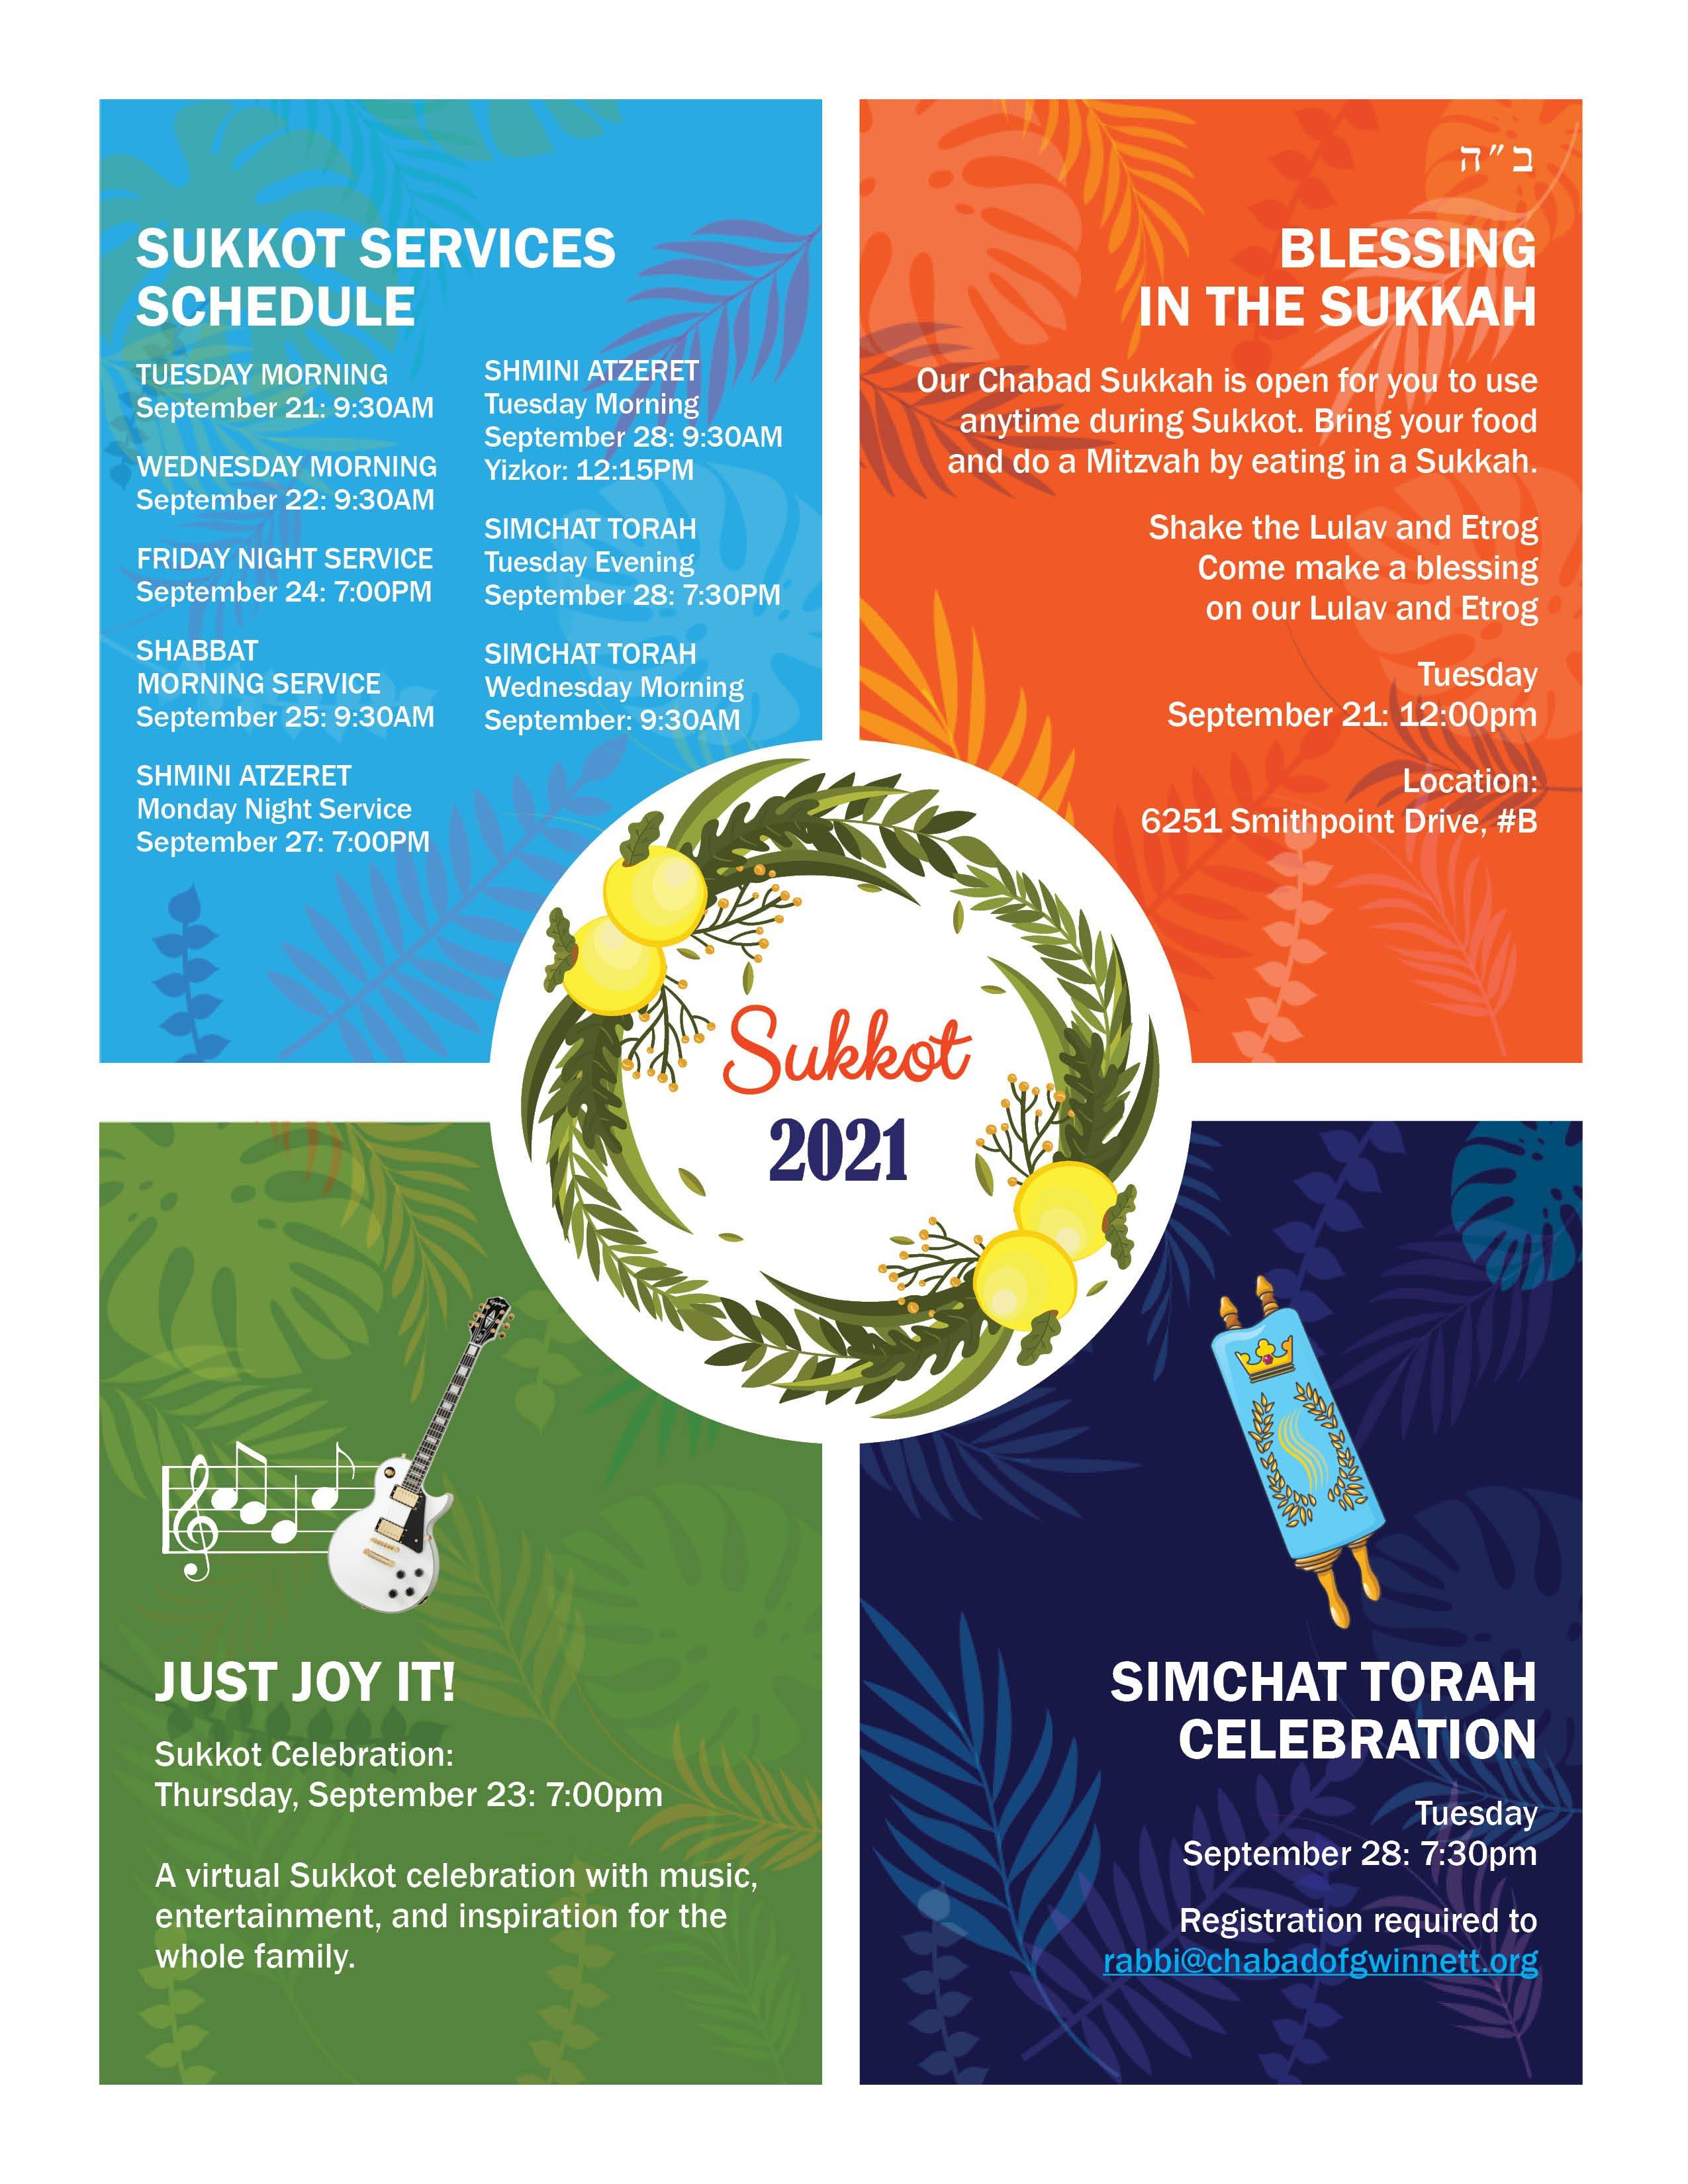 Sukkot Emailer 2020_FINAL.jpg